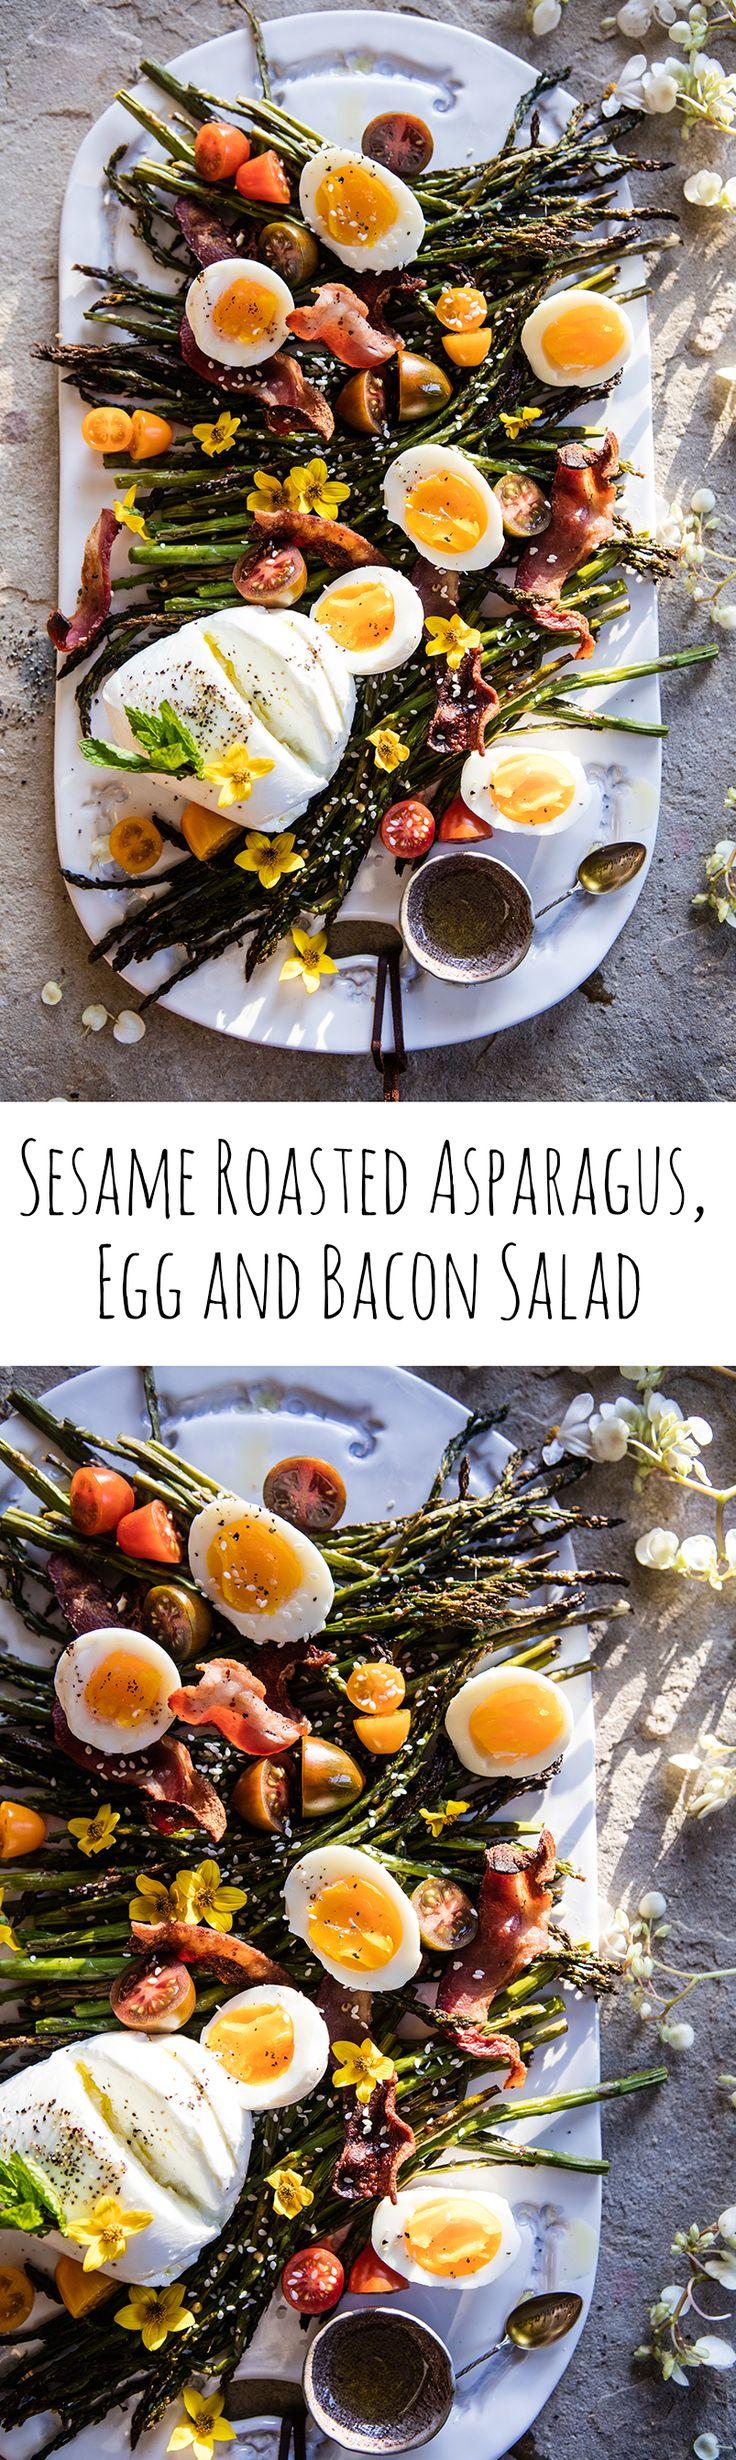 Sesame Roasted Asparagus, Egg and Bacon Salad   halfbakedharvest.com @hbharvest